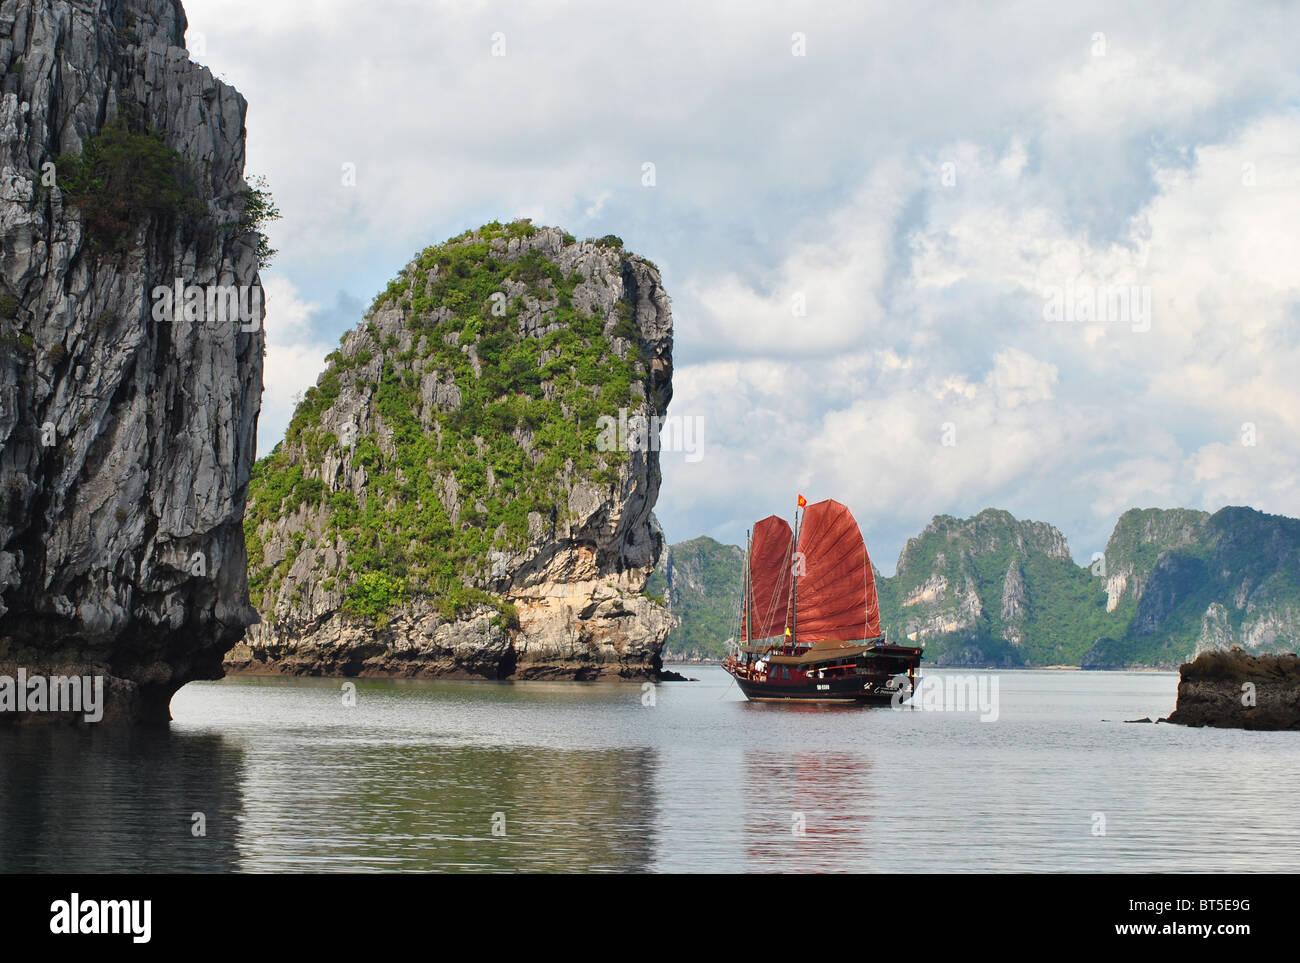 Dschunke mit roten Segel unter Kalksteininseln in Ha Long Bucht, Vietnam Stockbild